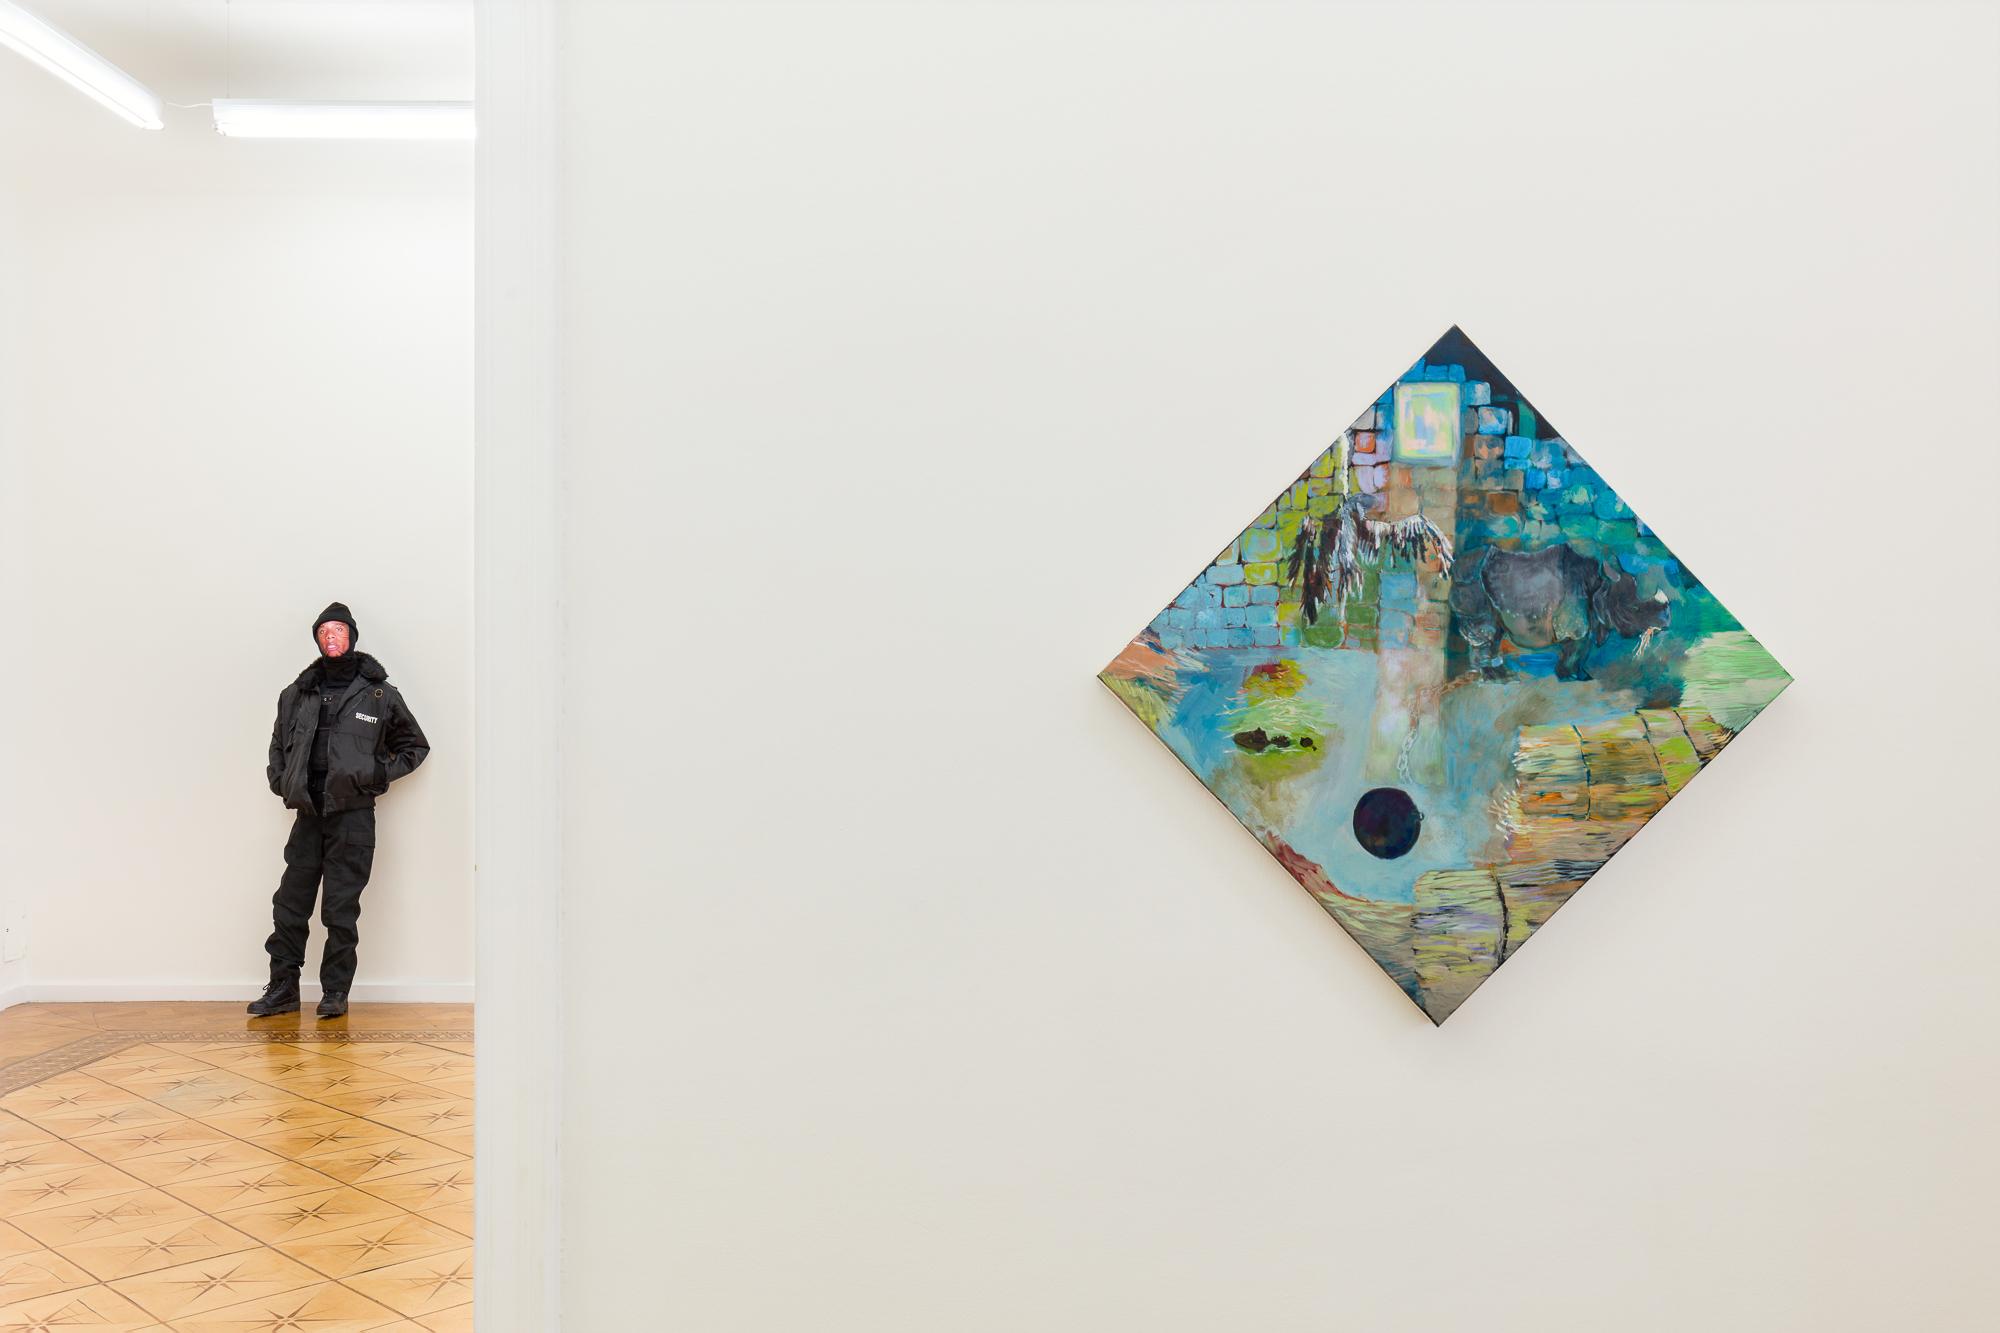 2019_01_28_Georgia Gardner Gray at Croy Nielsen by Kunstdokumentationcom_v2_017_web.jpg